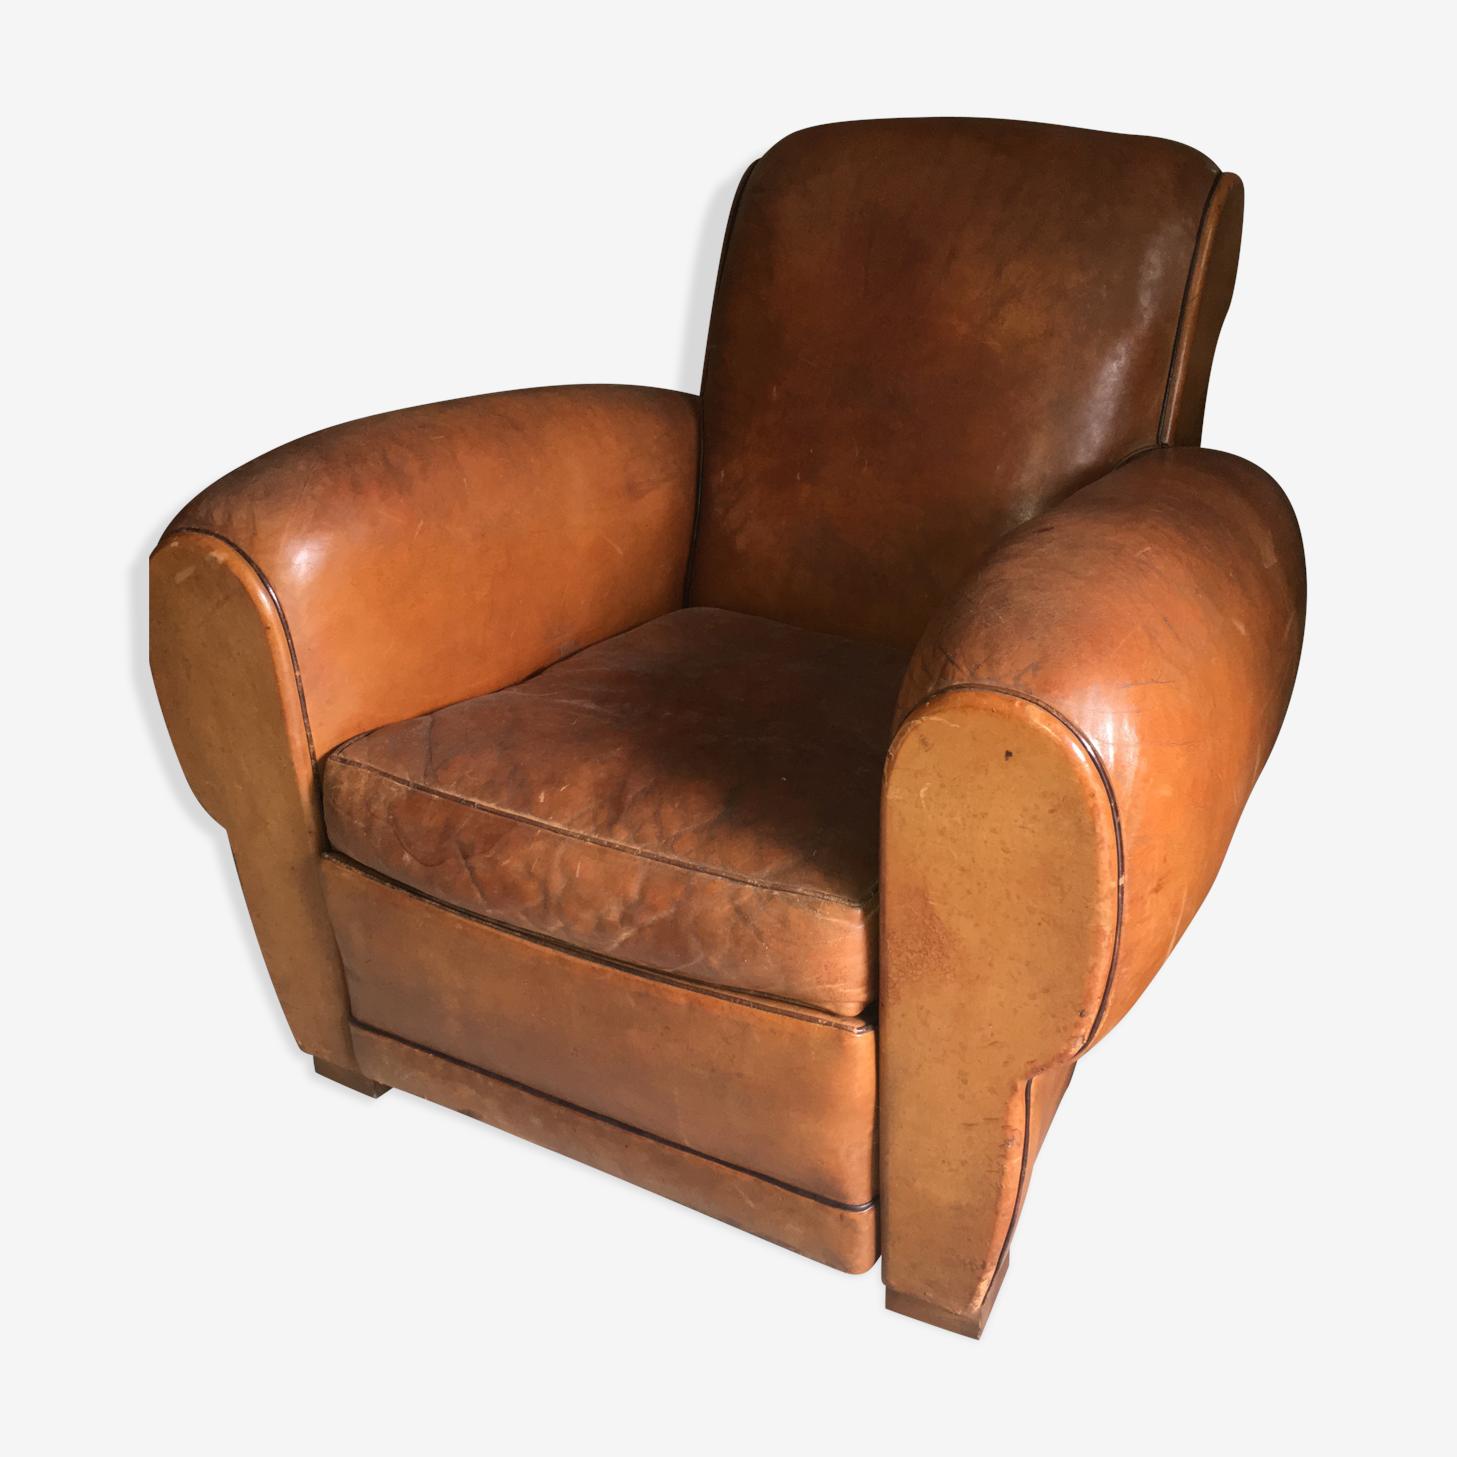 Old club armchair 40/50